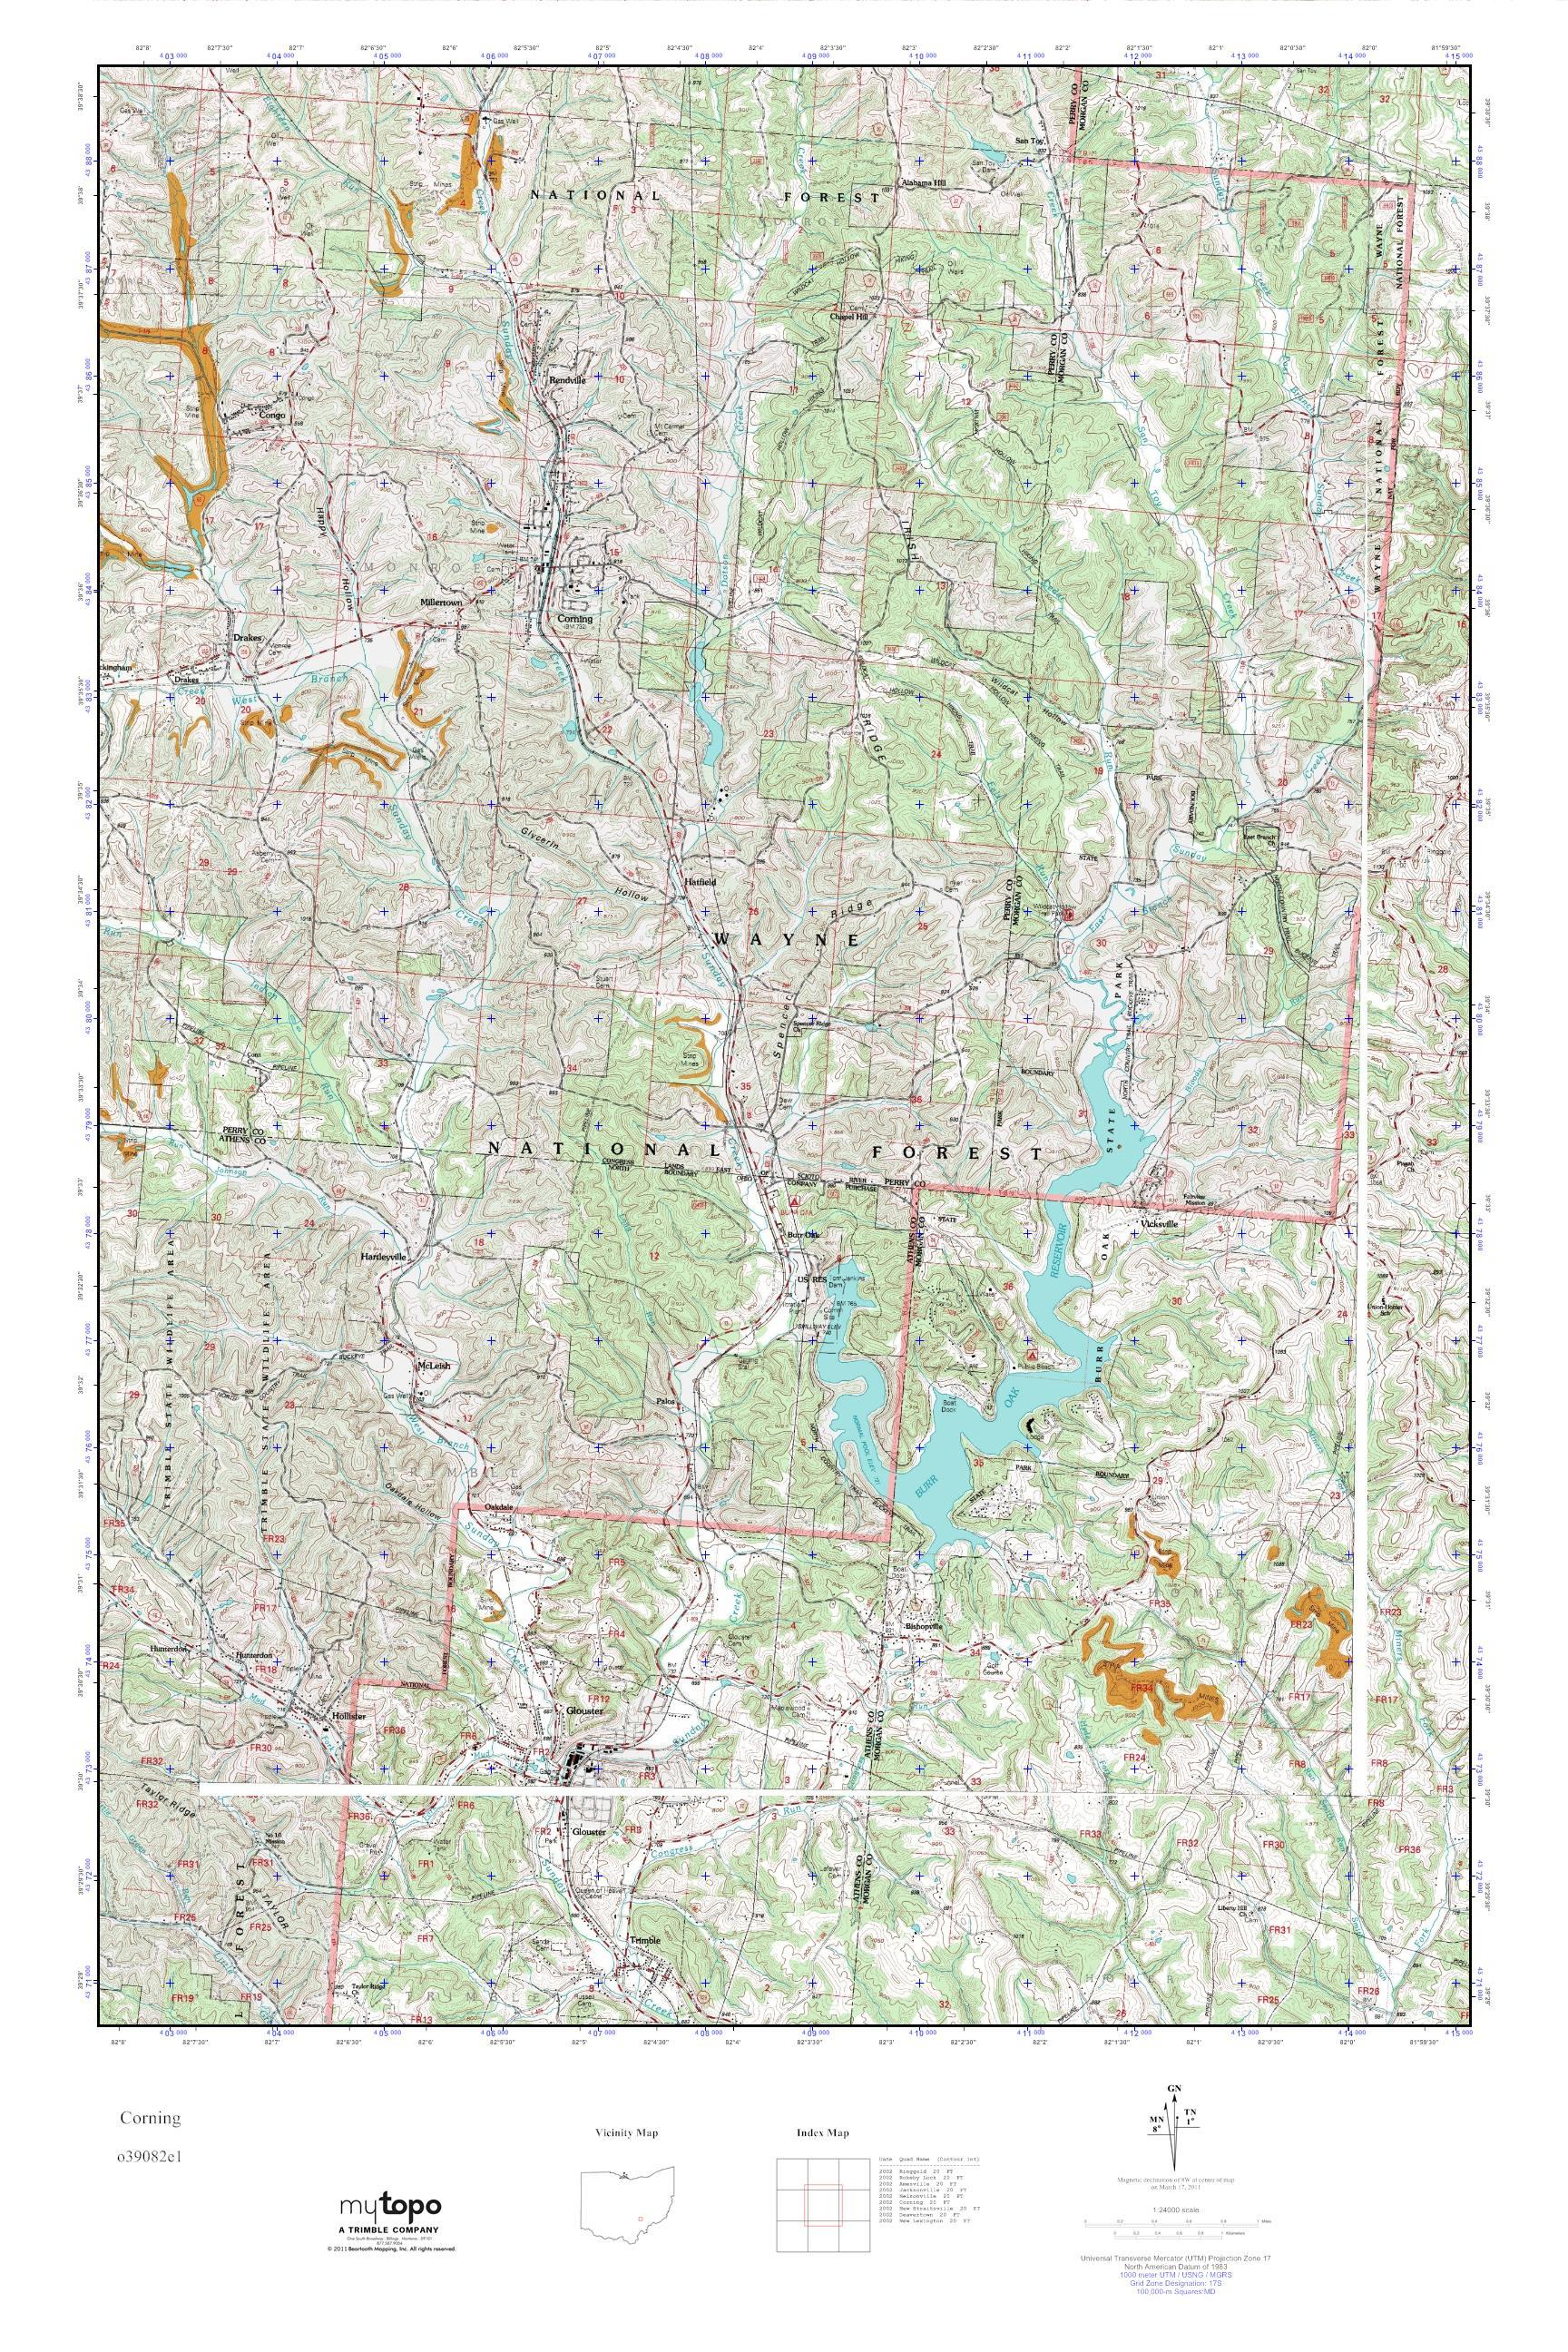 MyTopo Corning, Ohio USGS Quad Topo Map